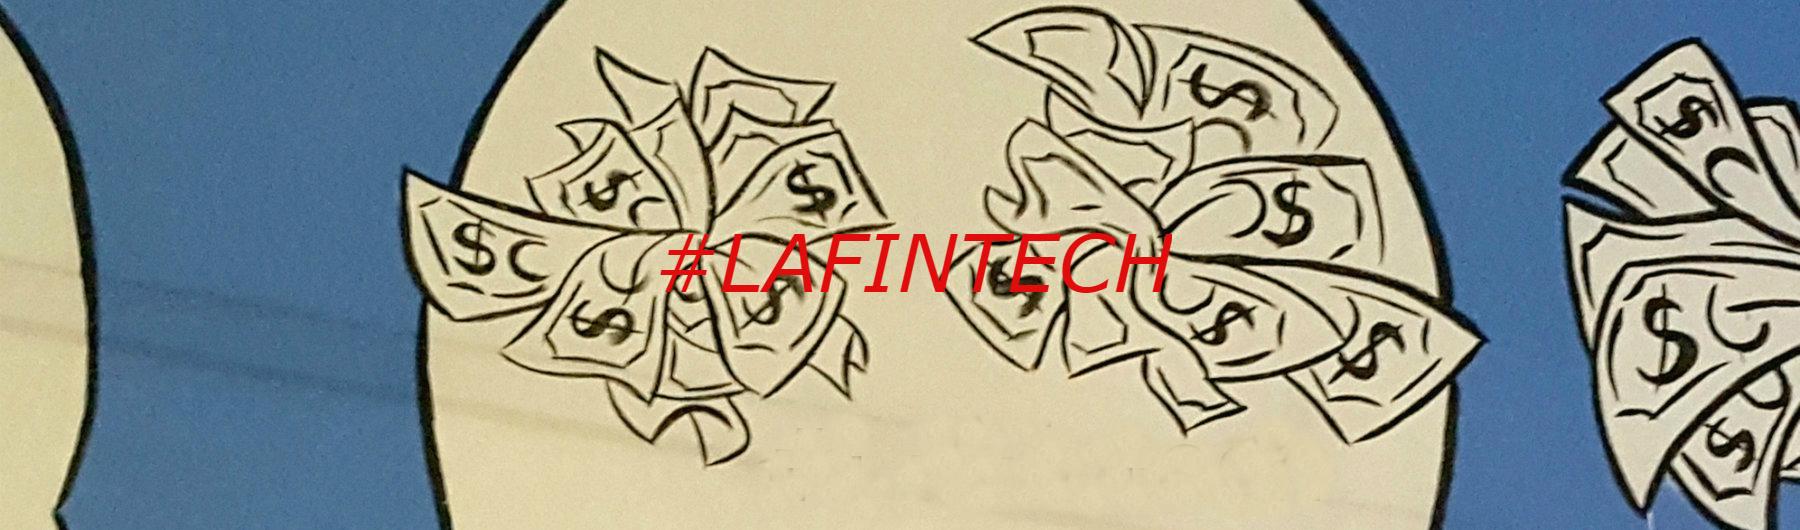 LA Fintech Demo Mix Mingle Network